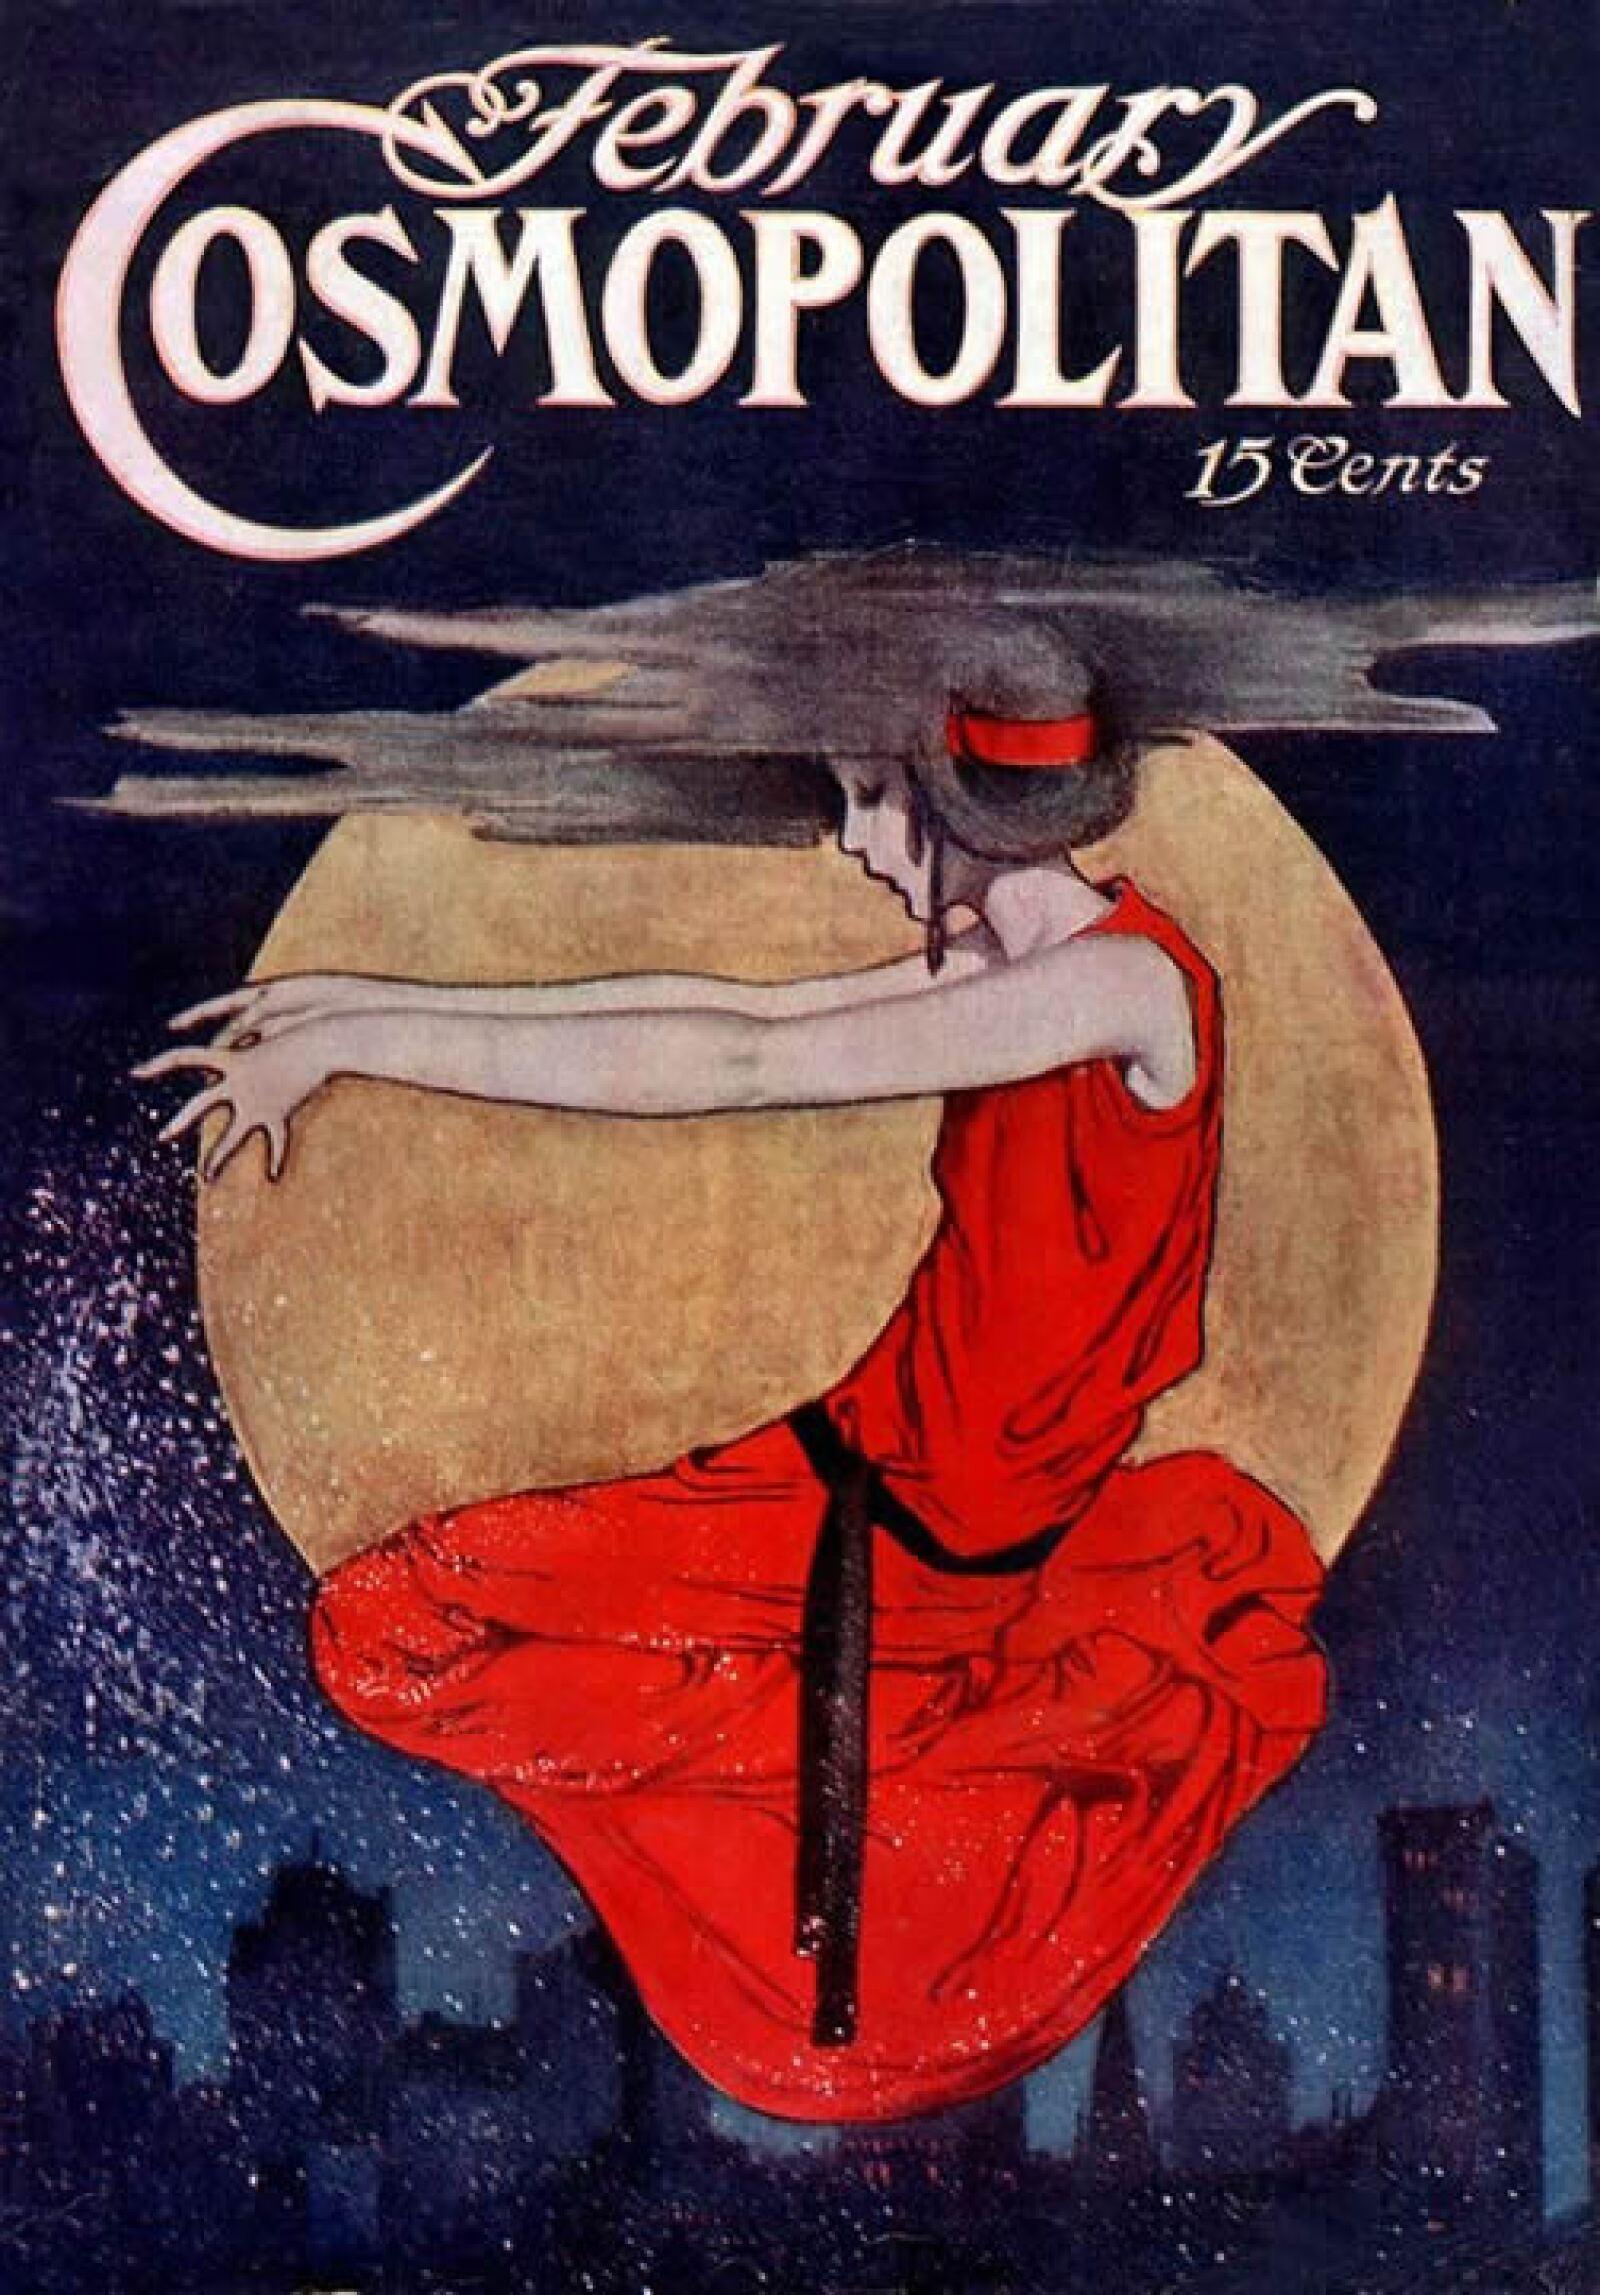 Cosmopolitan, febrero 1909